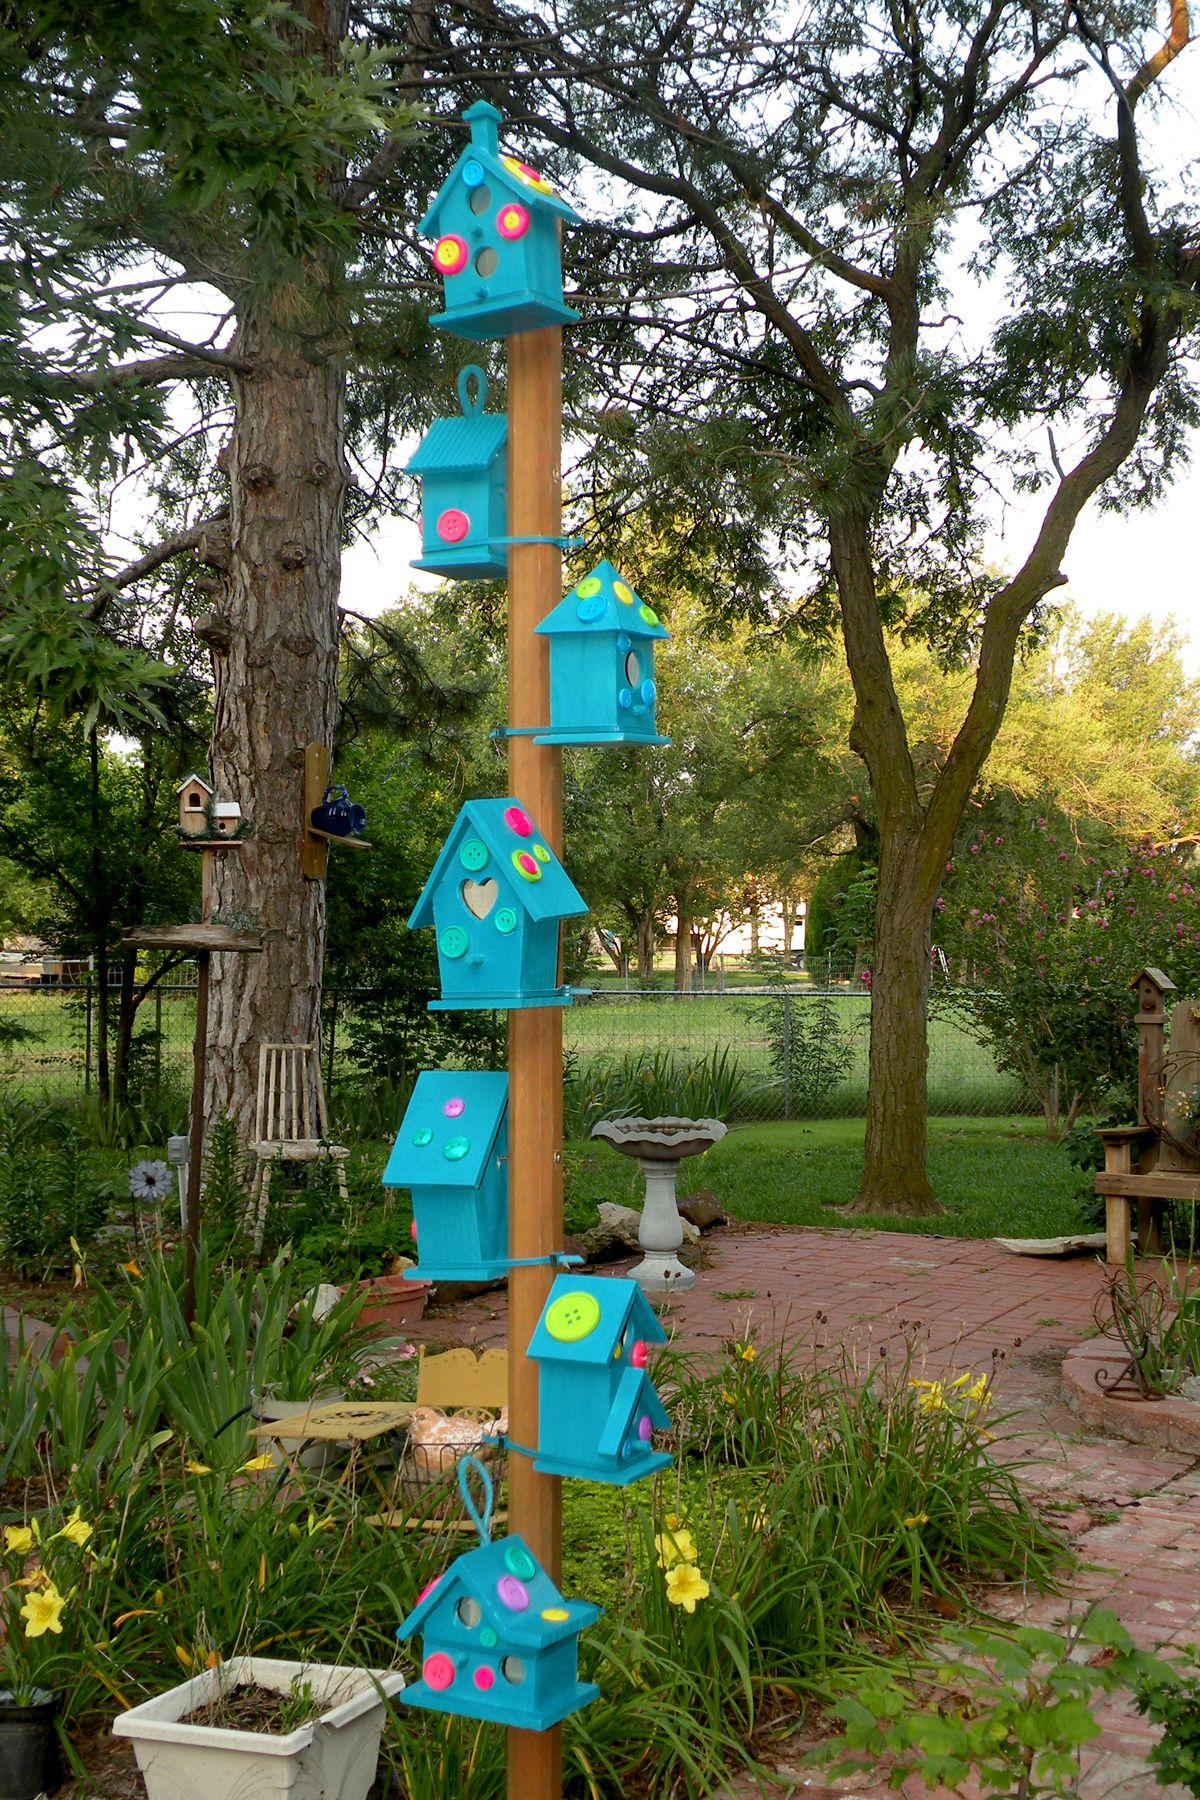 Pin By Catherine Miller On Birdhouses Bird Houses Diy Bird Houses Painted Bird Houses